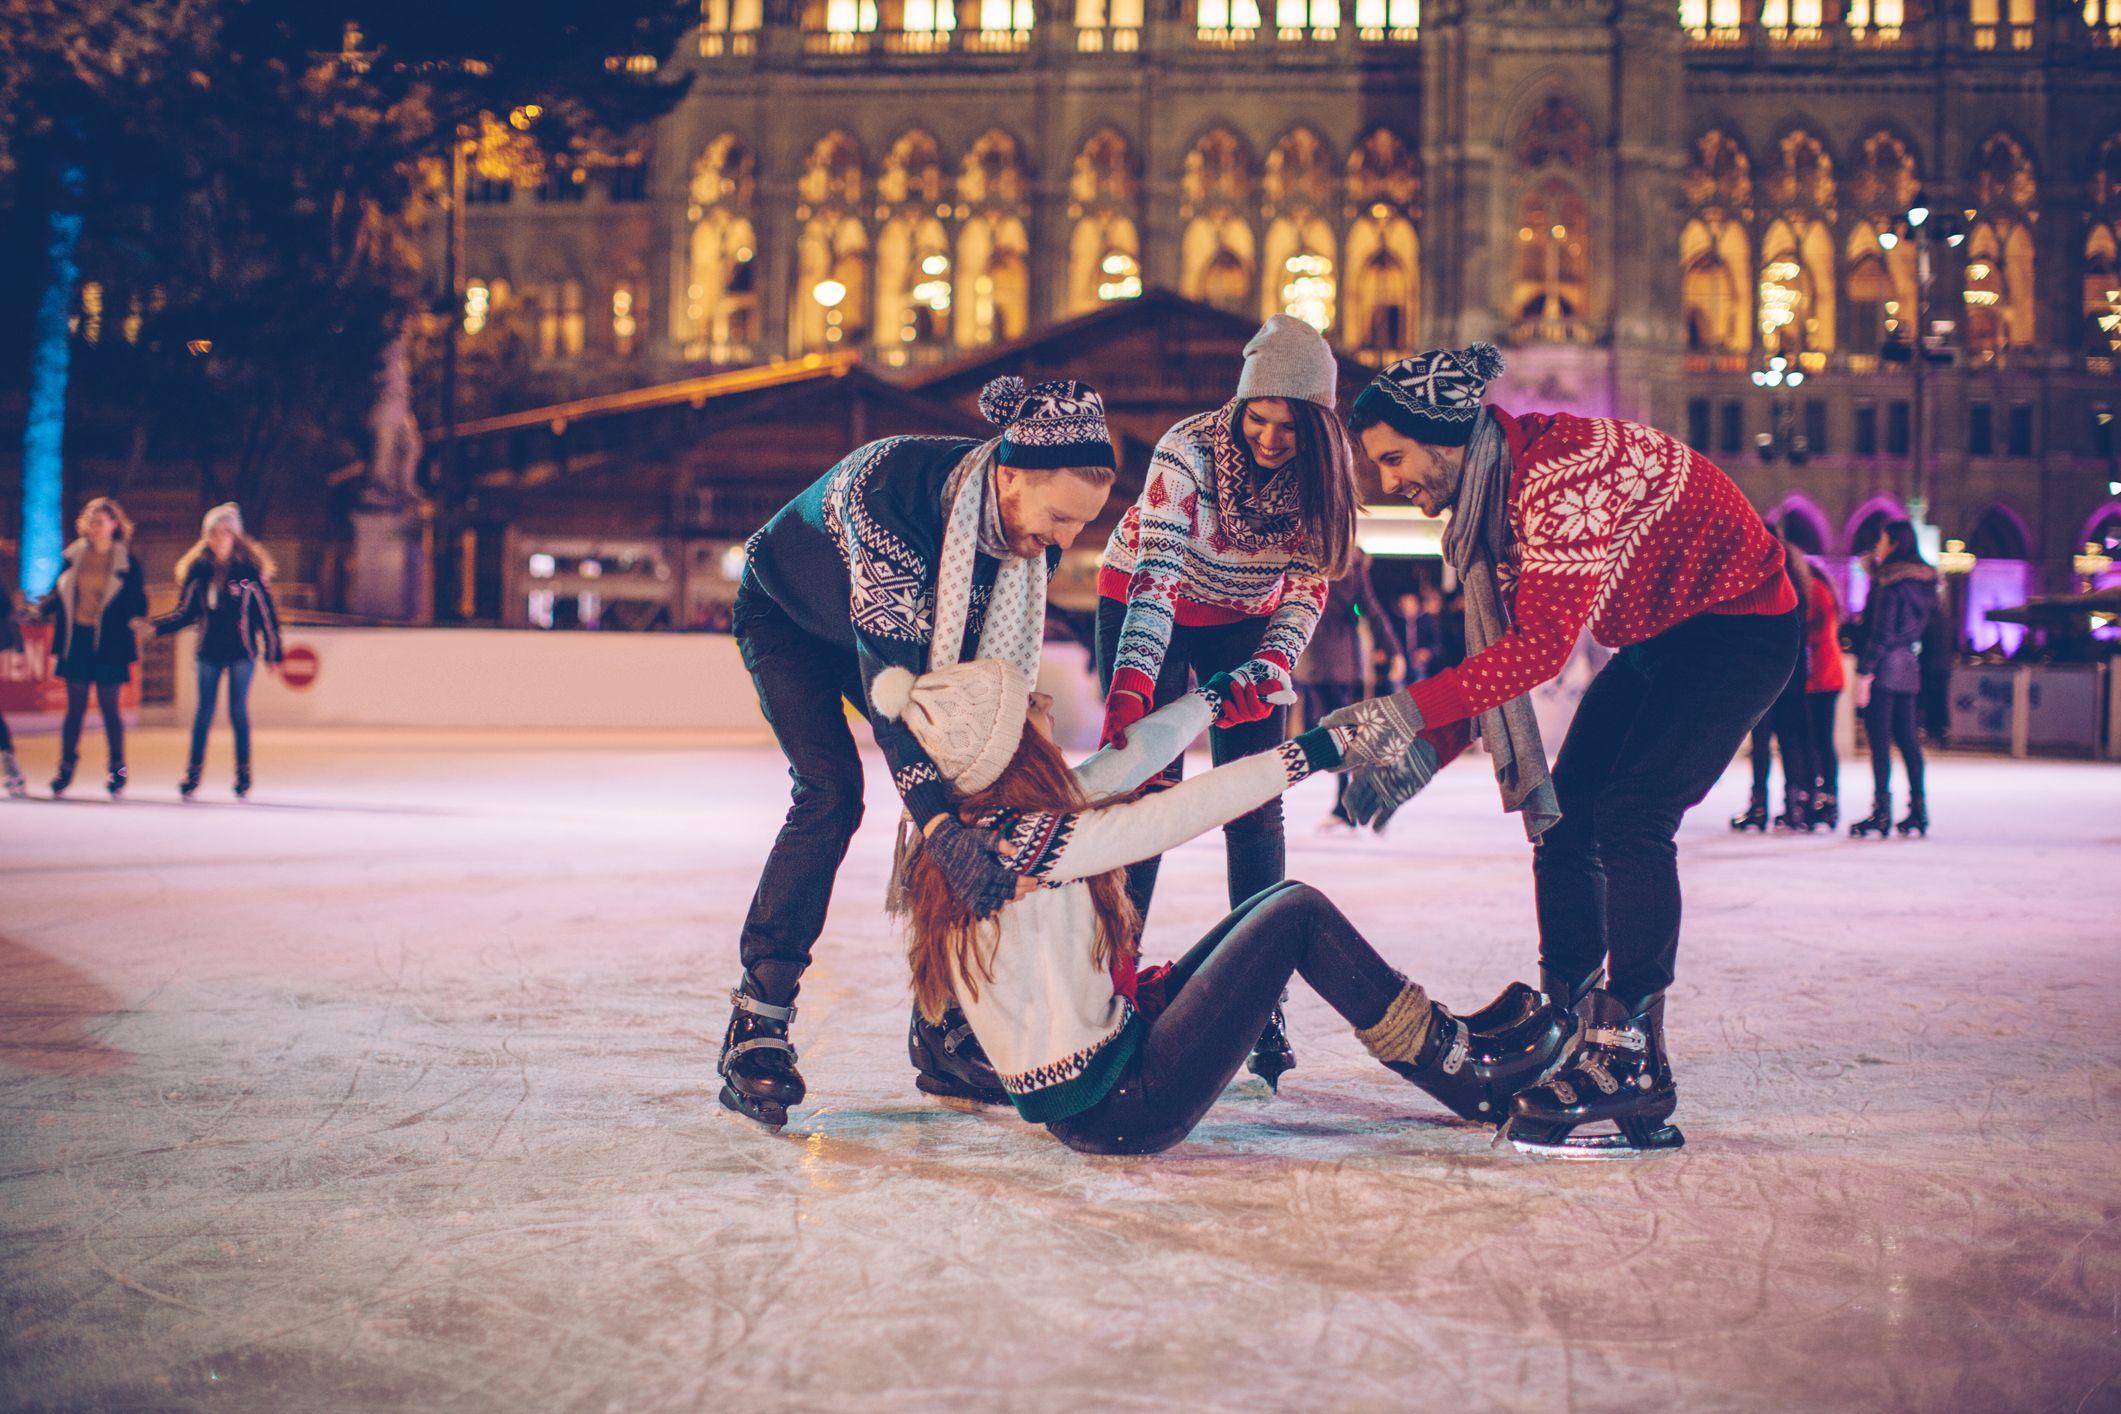 Ir a patinar sobre hielo